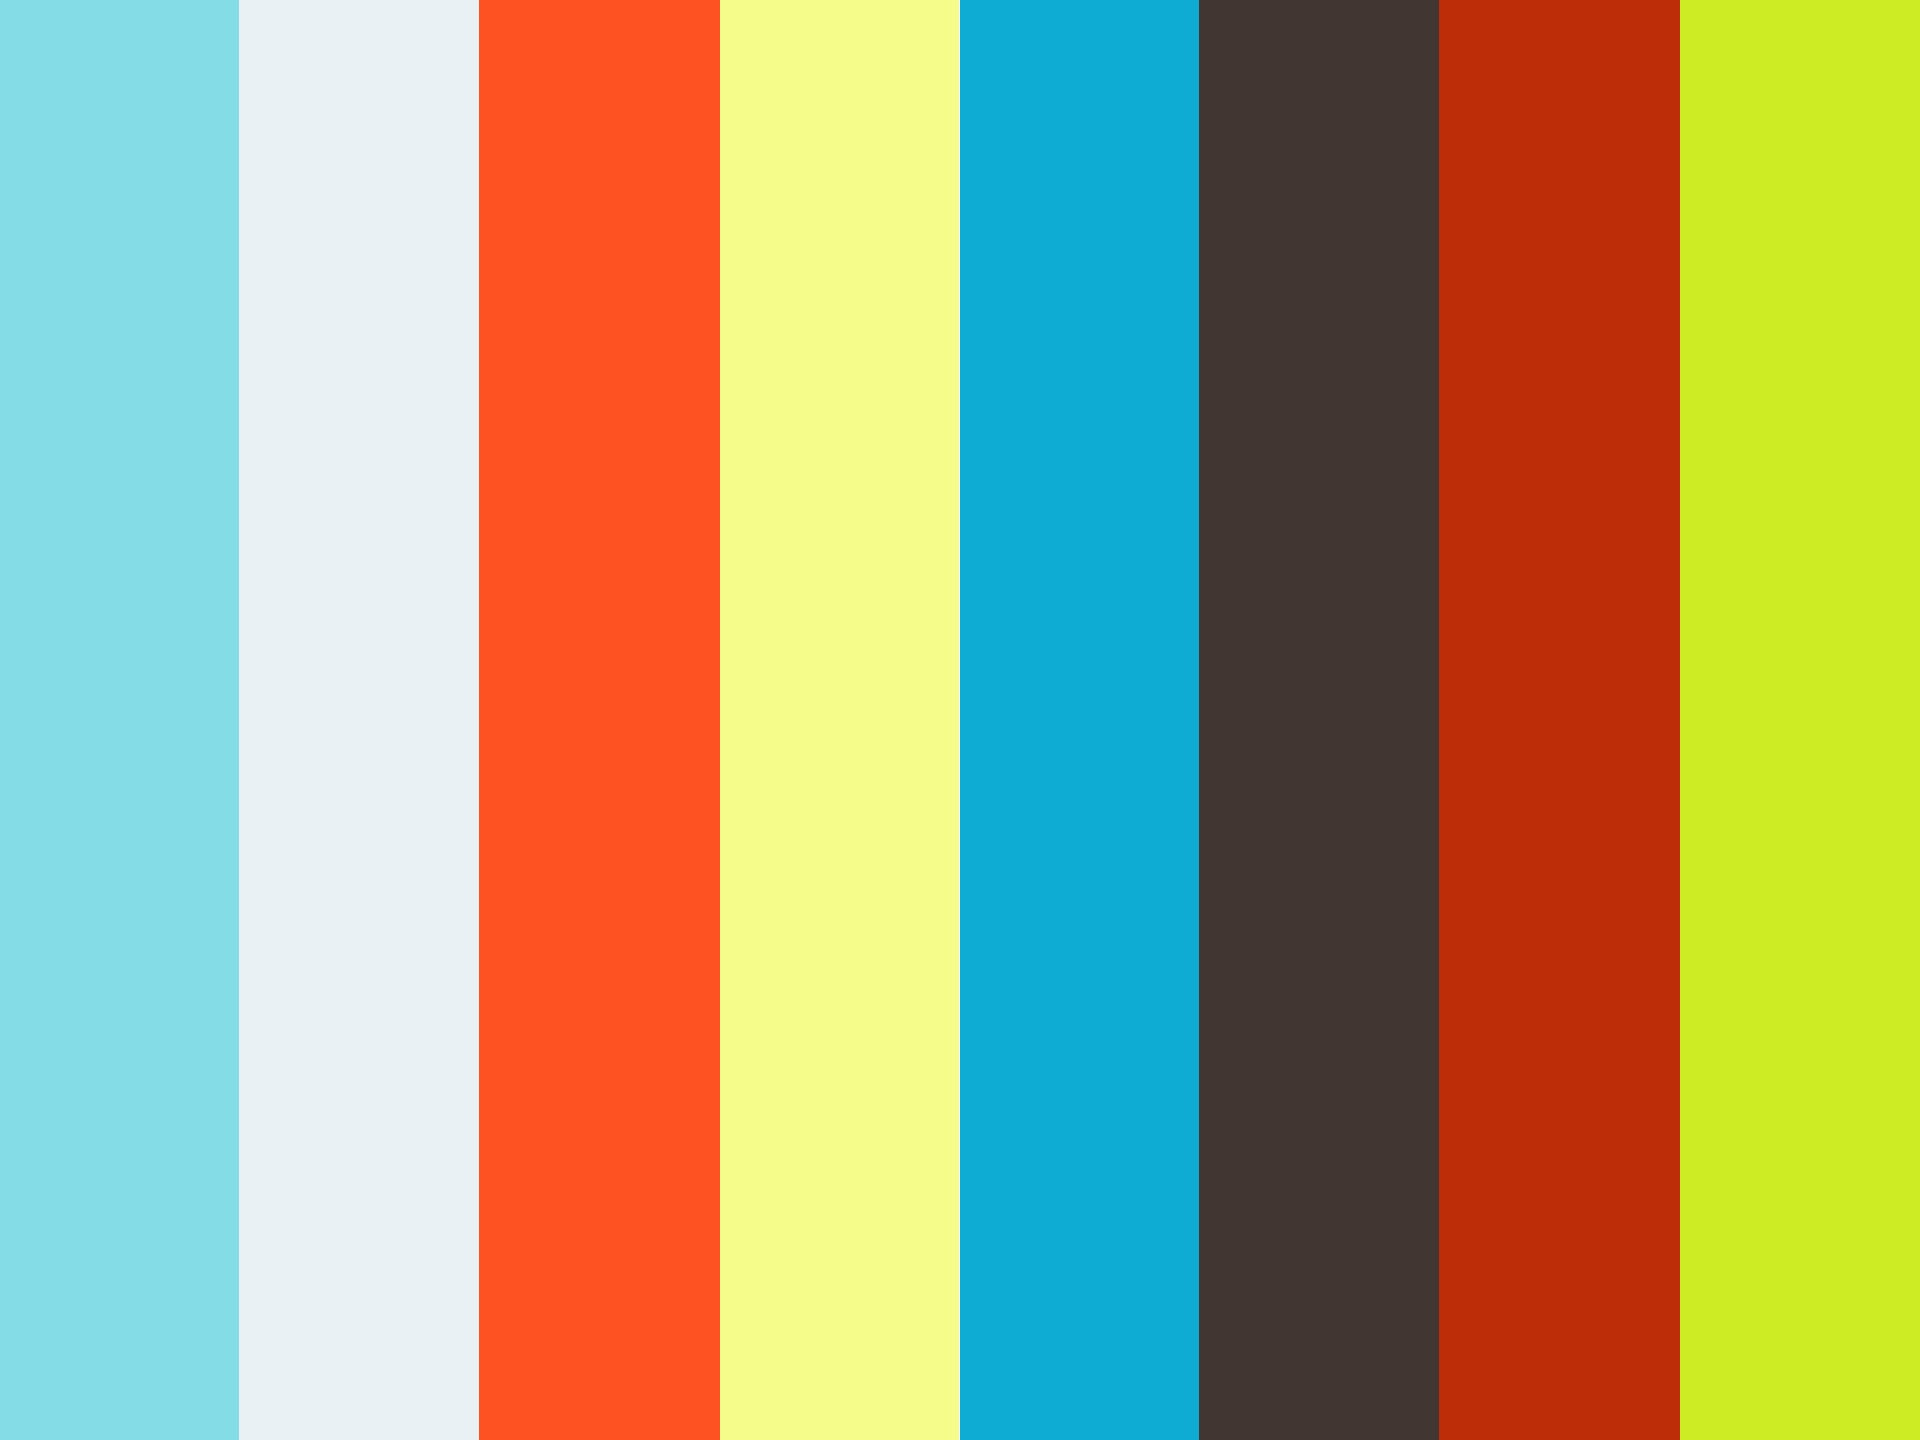 Mr Tic Toc Animation Test On Vimeo # Muebles Tic Toc